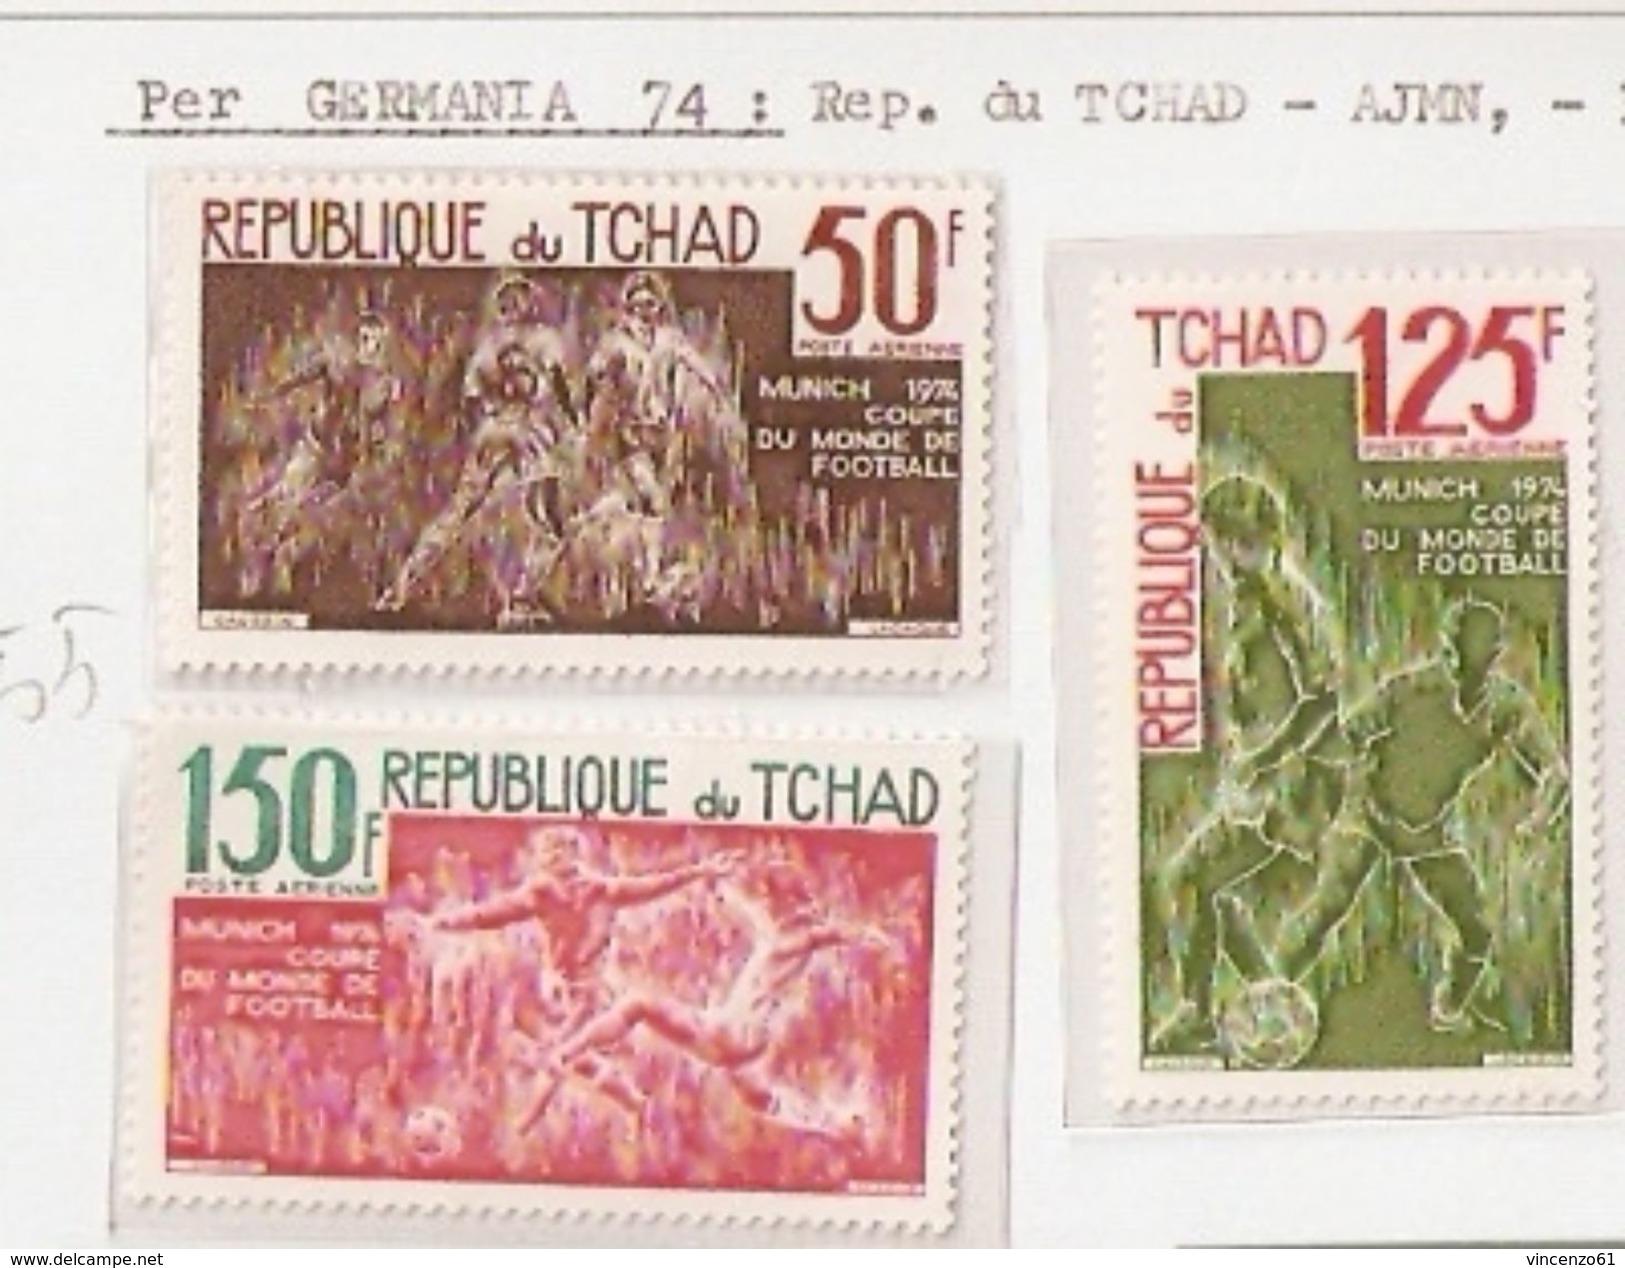 REPUBLIQUE DU TCHAD FIFA WORLD CUP 1974 GERMANY 1974 - Coppa Del Mondo